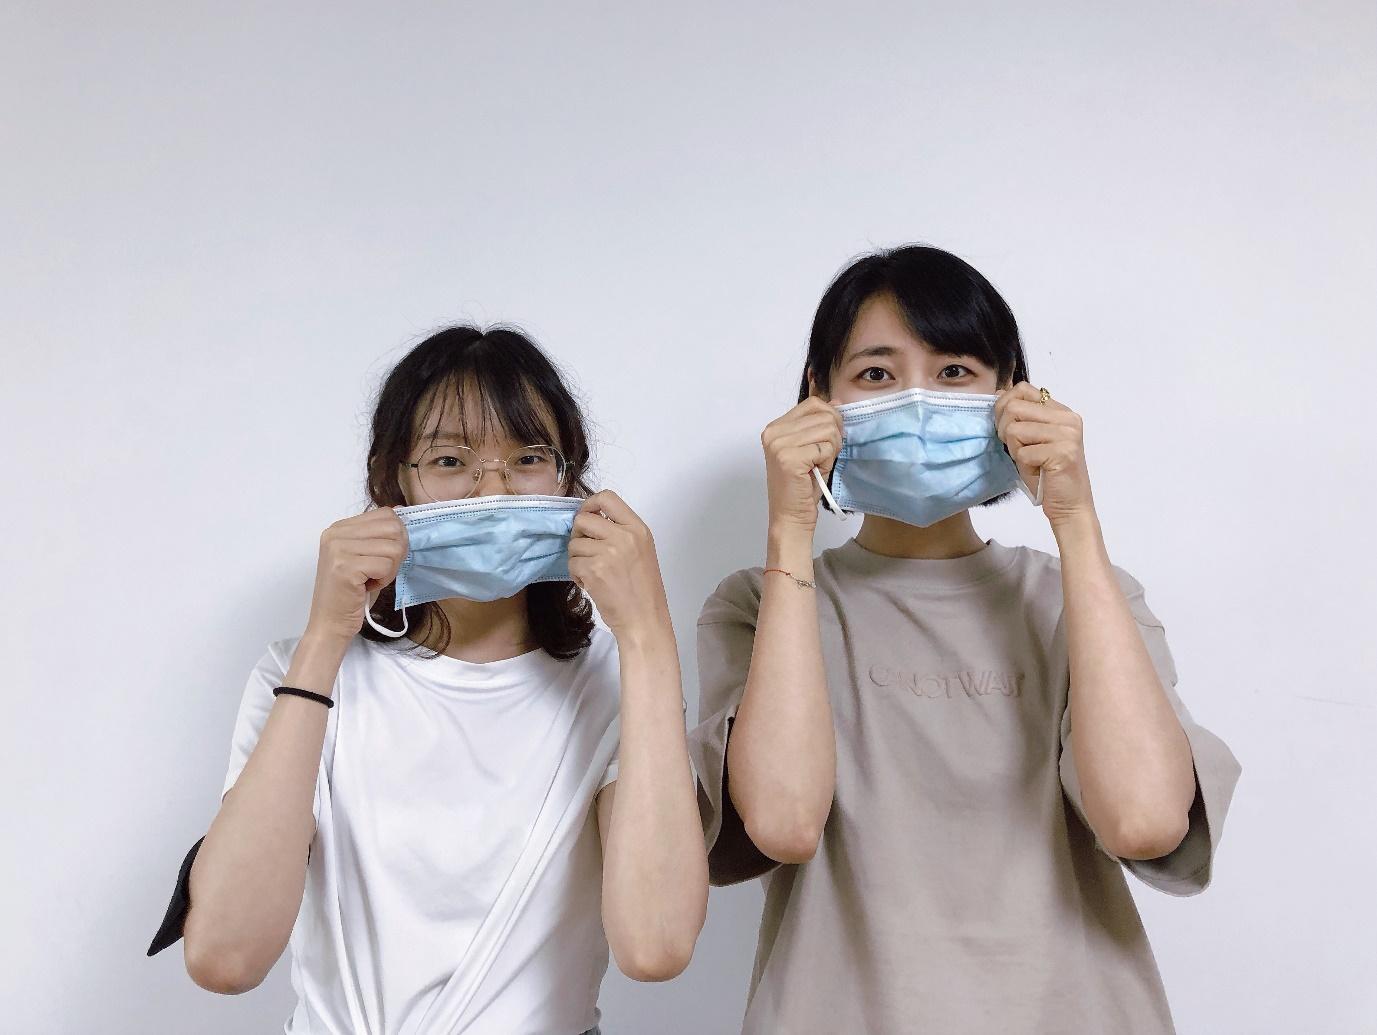 Wearing Surgical Masks